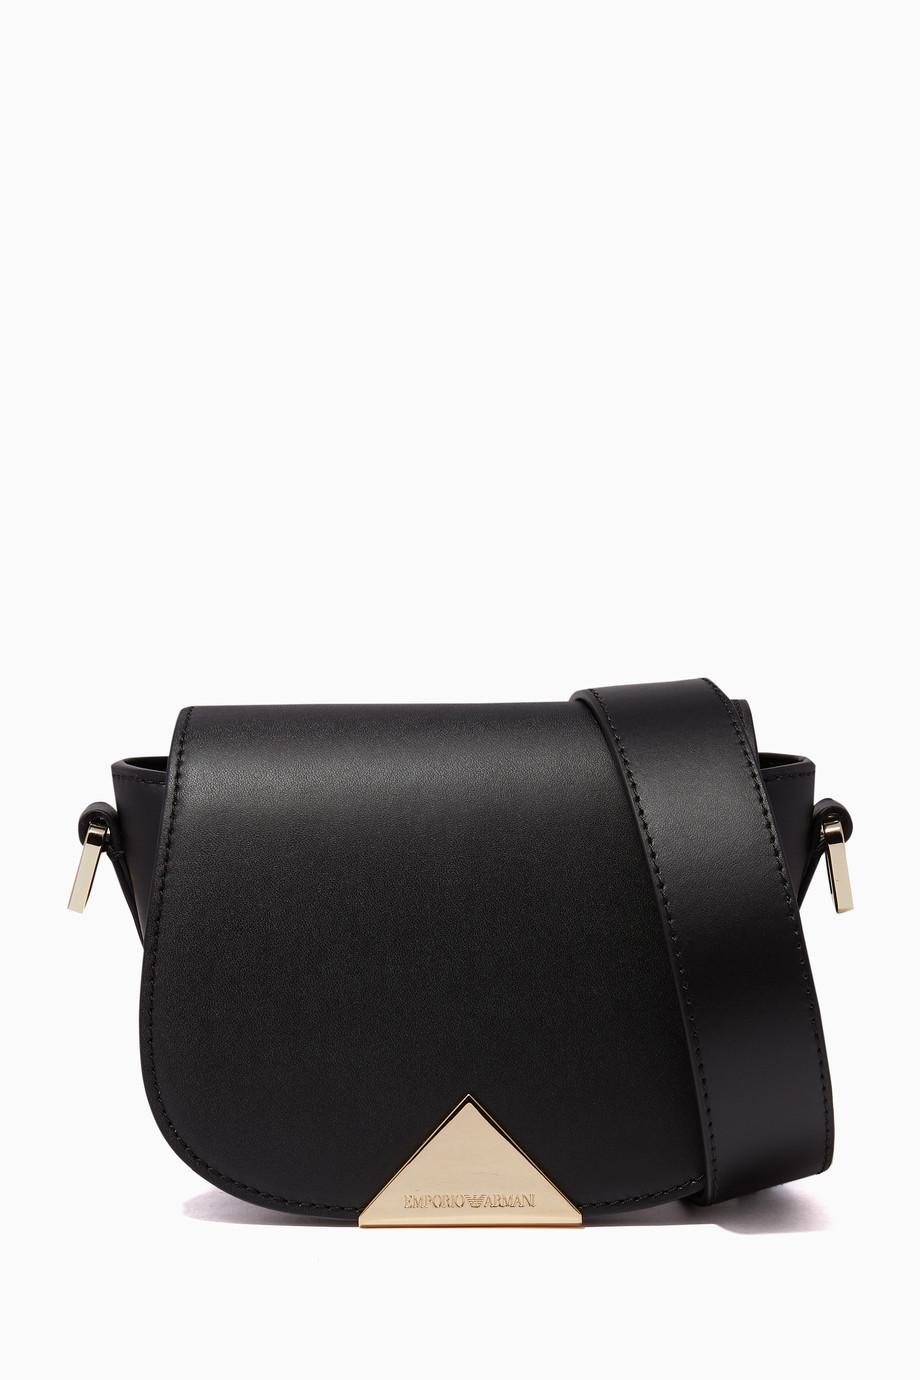 bd173b9592 Shop Emporio Armani Black Small Peggy Cross-Body Bag for Women ...